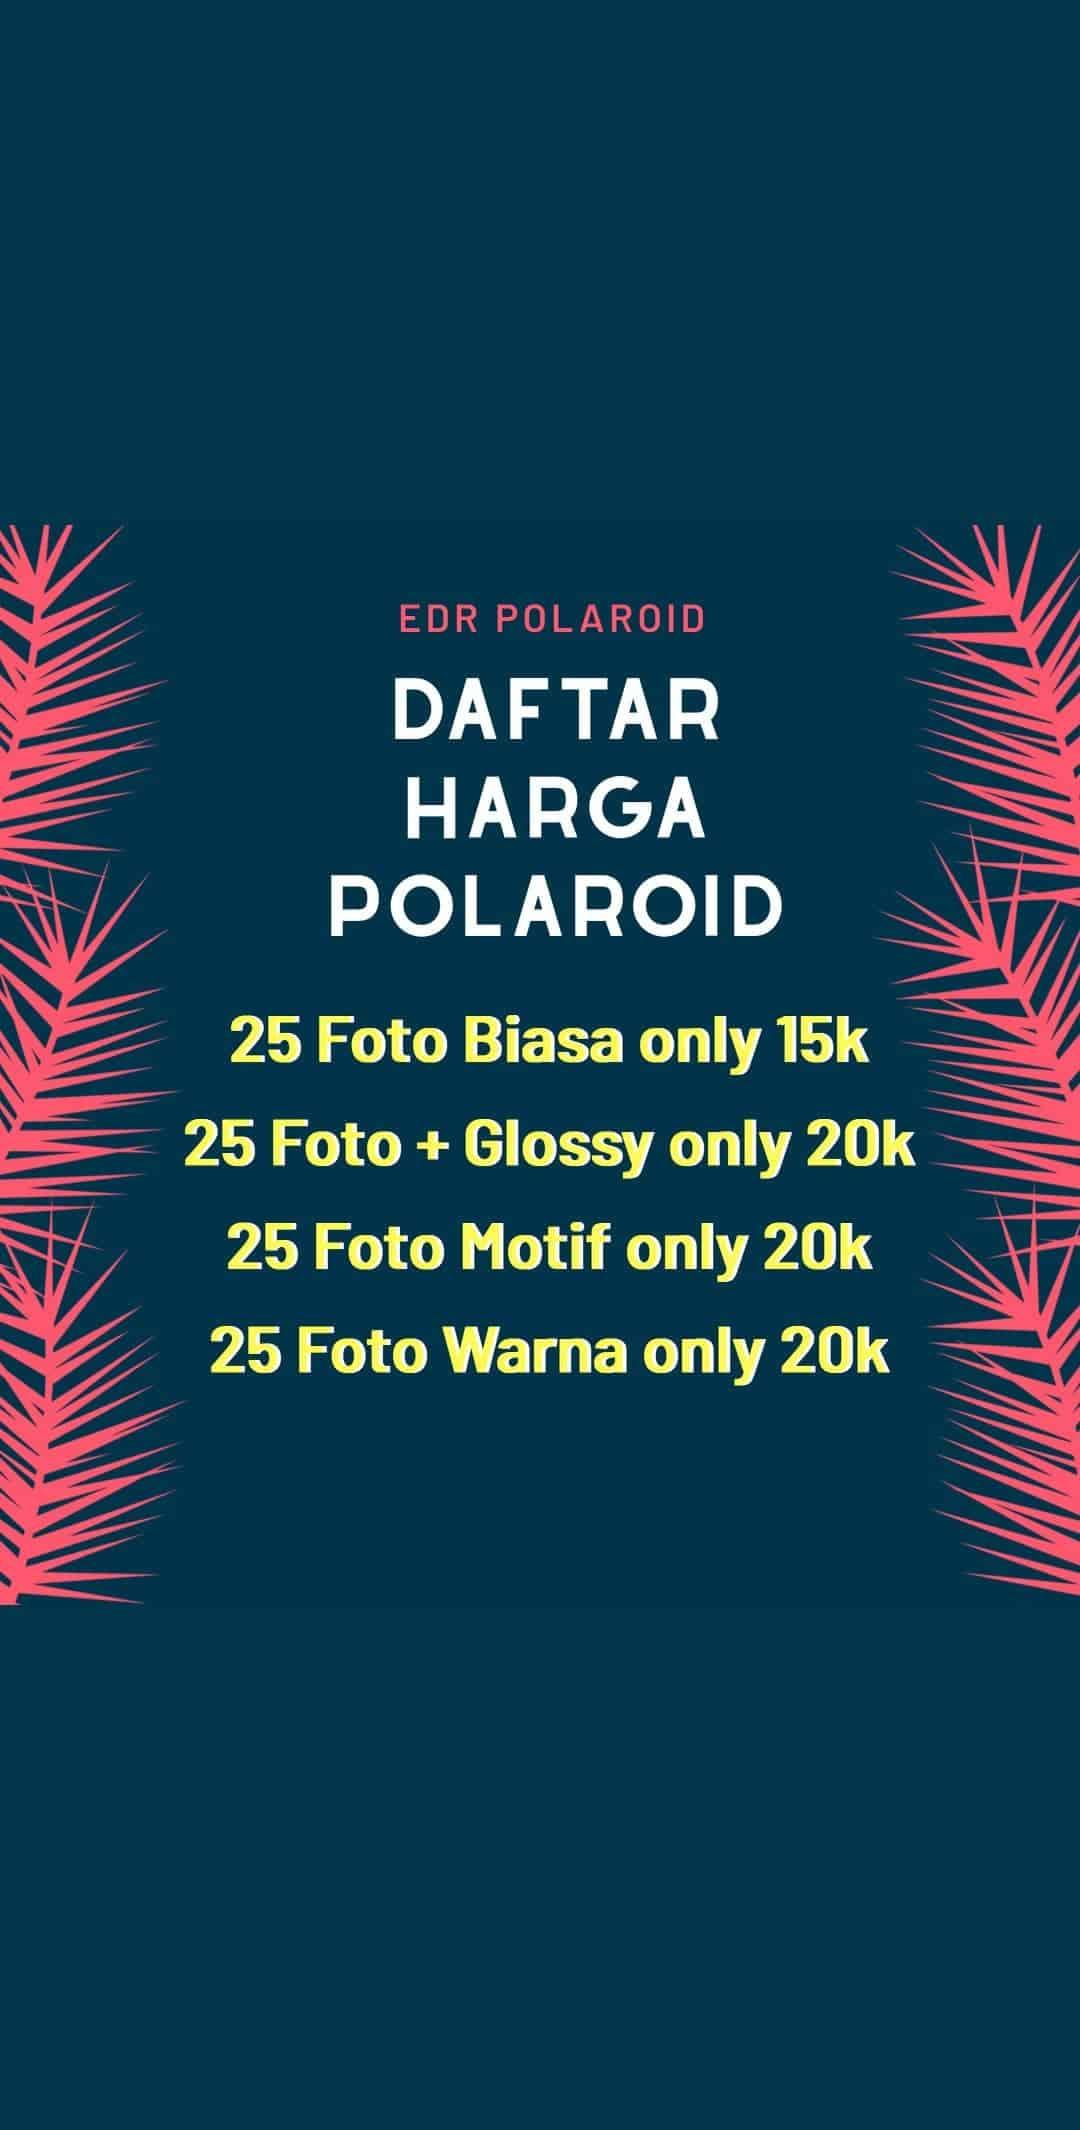 HargaJasa Cetak Foto Polaroid Purwokerto